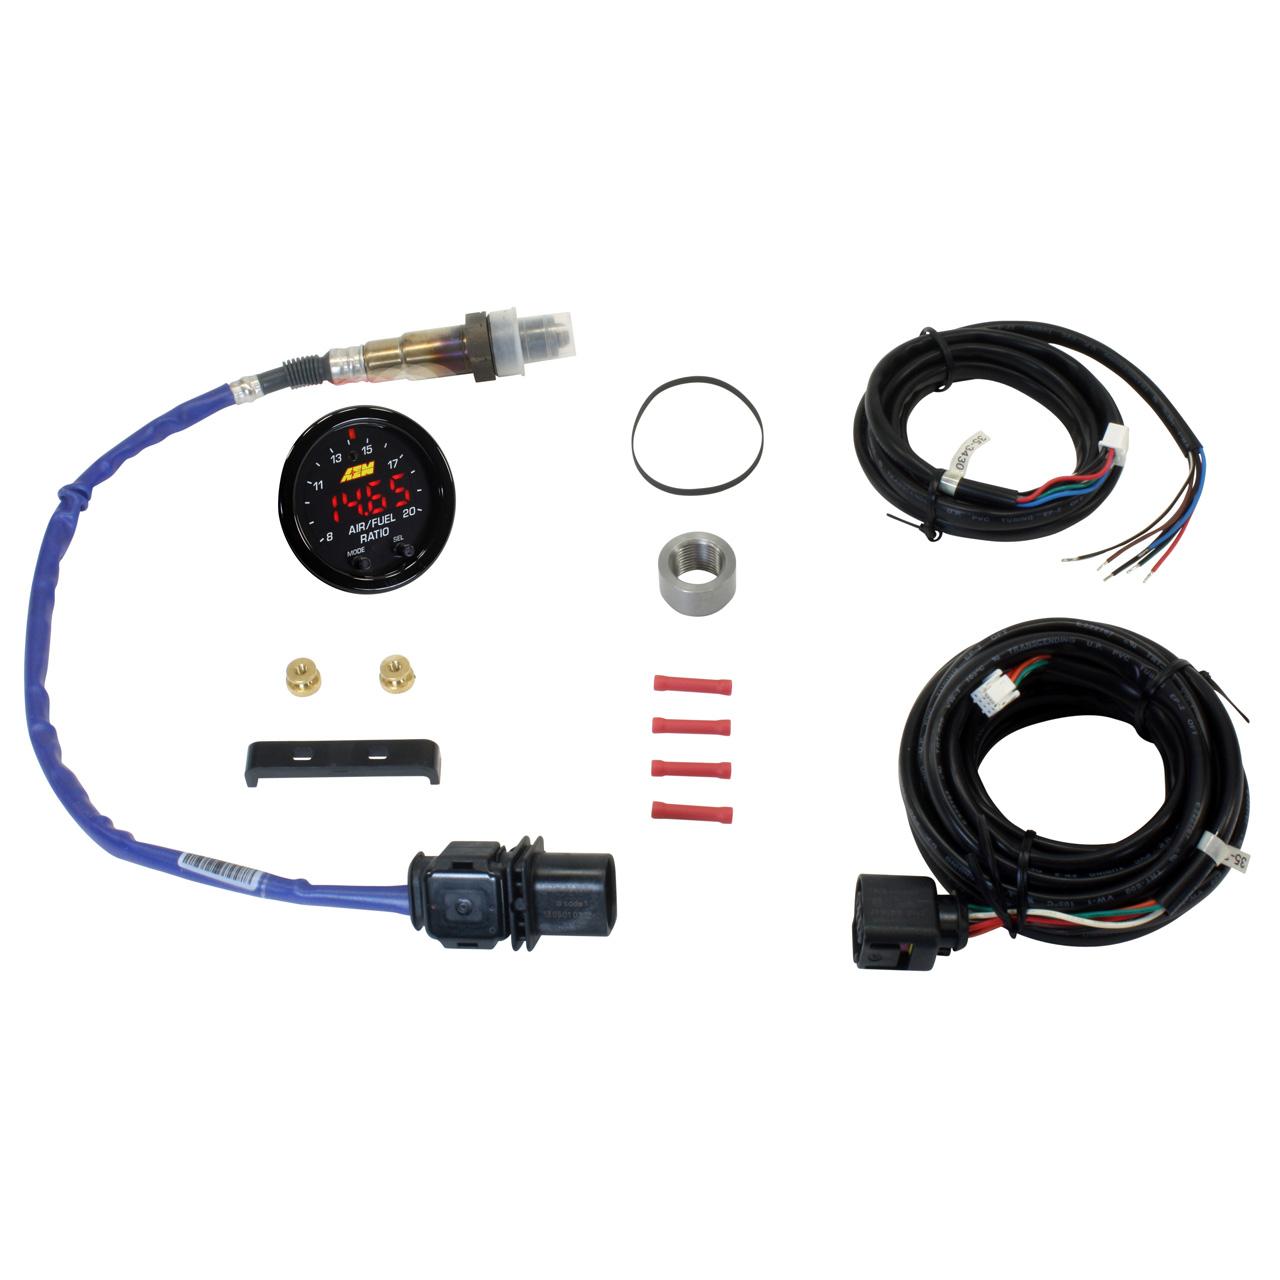 Pressure Regulator Diaphragm Kit 35-100QFT Works w//Holley® and QFT® Regulators.